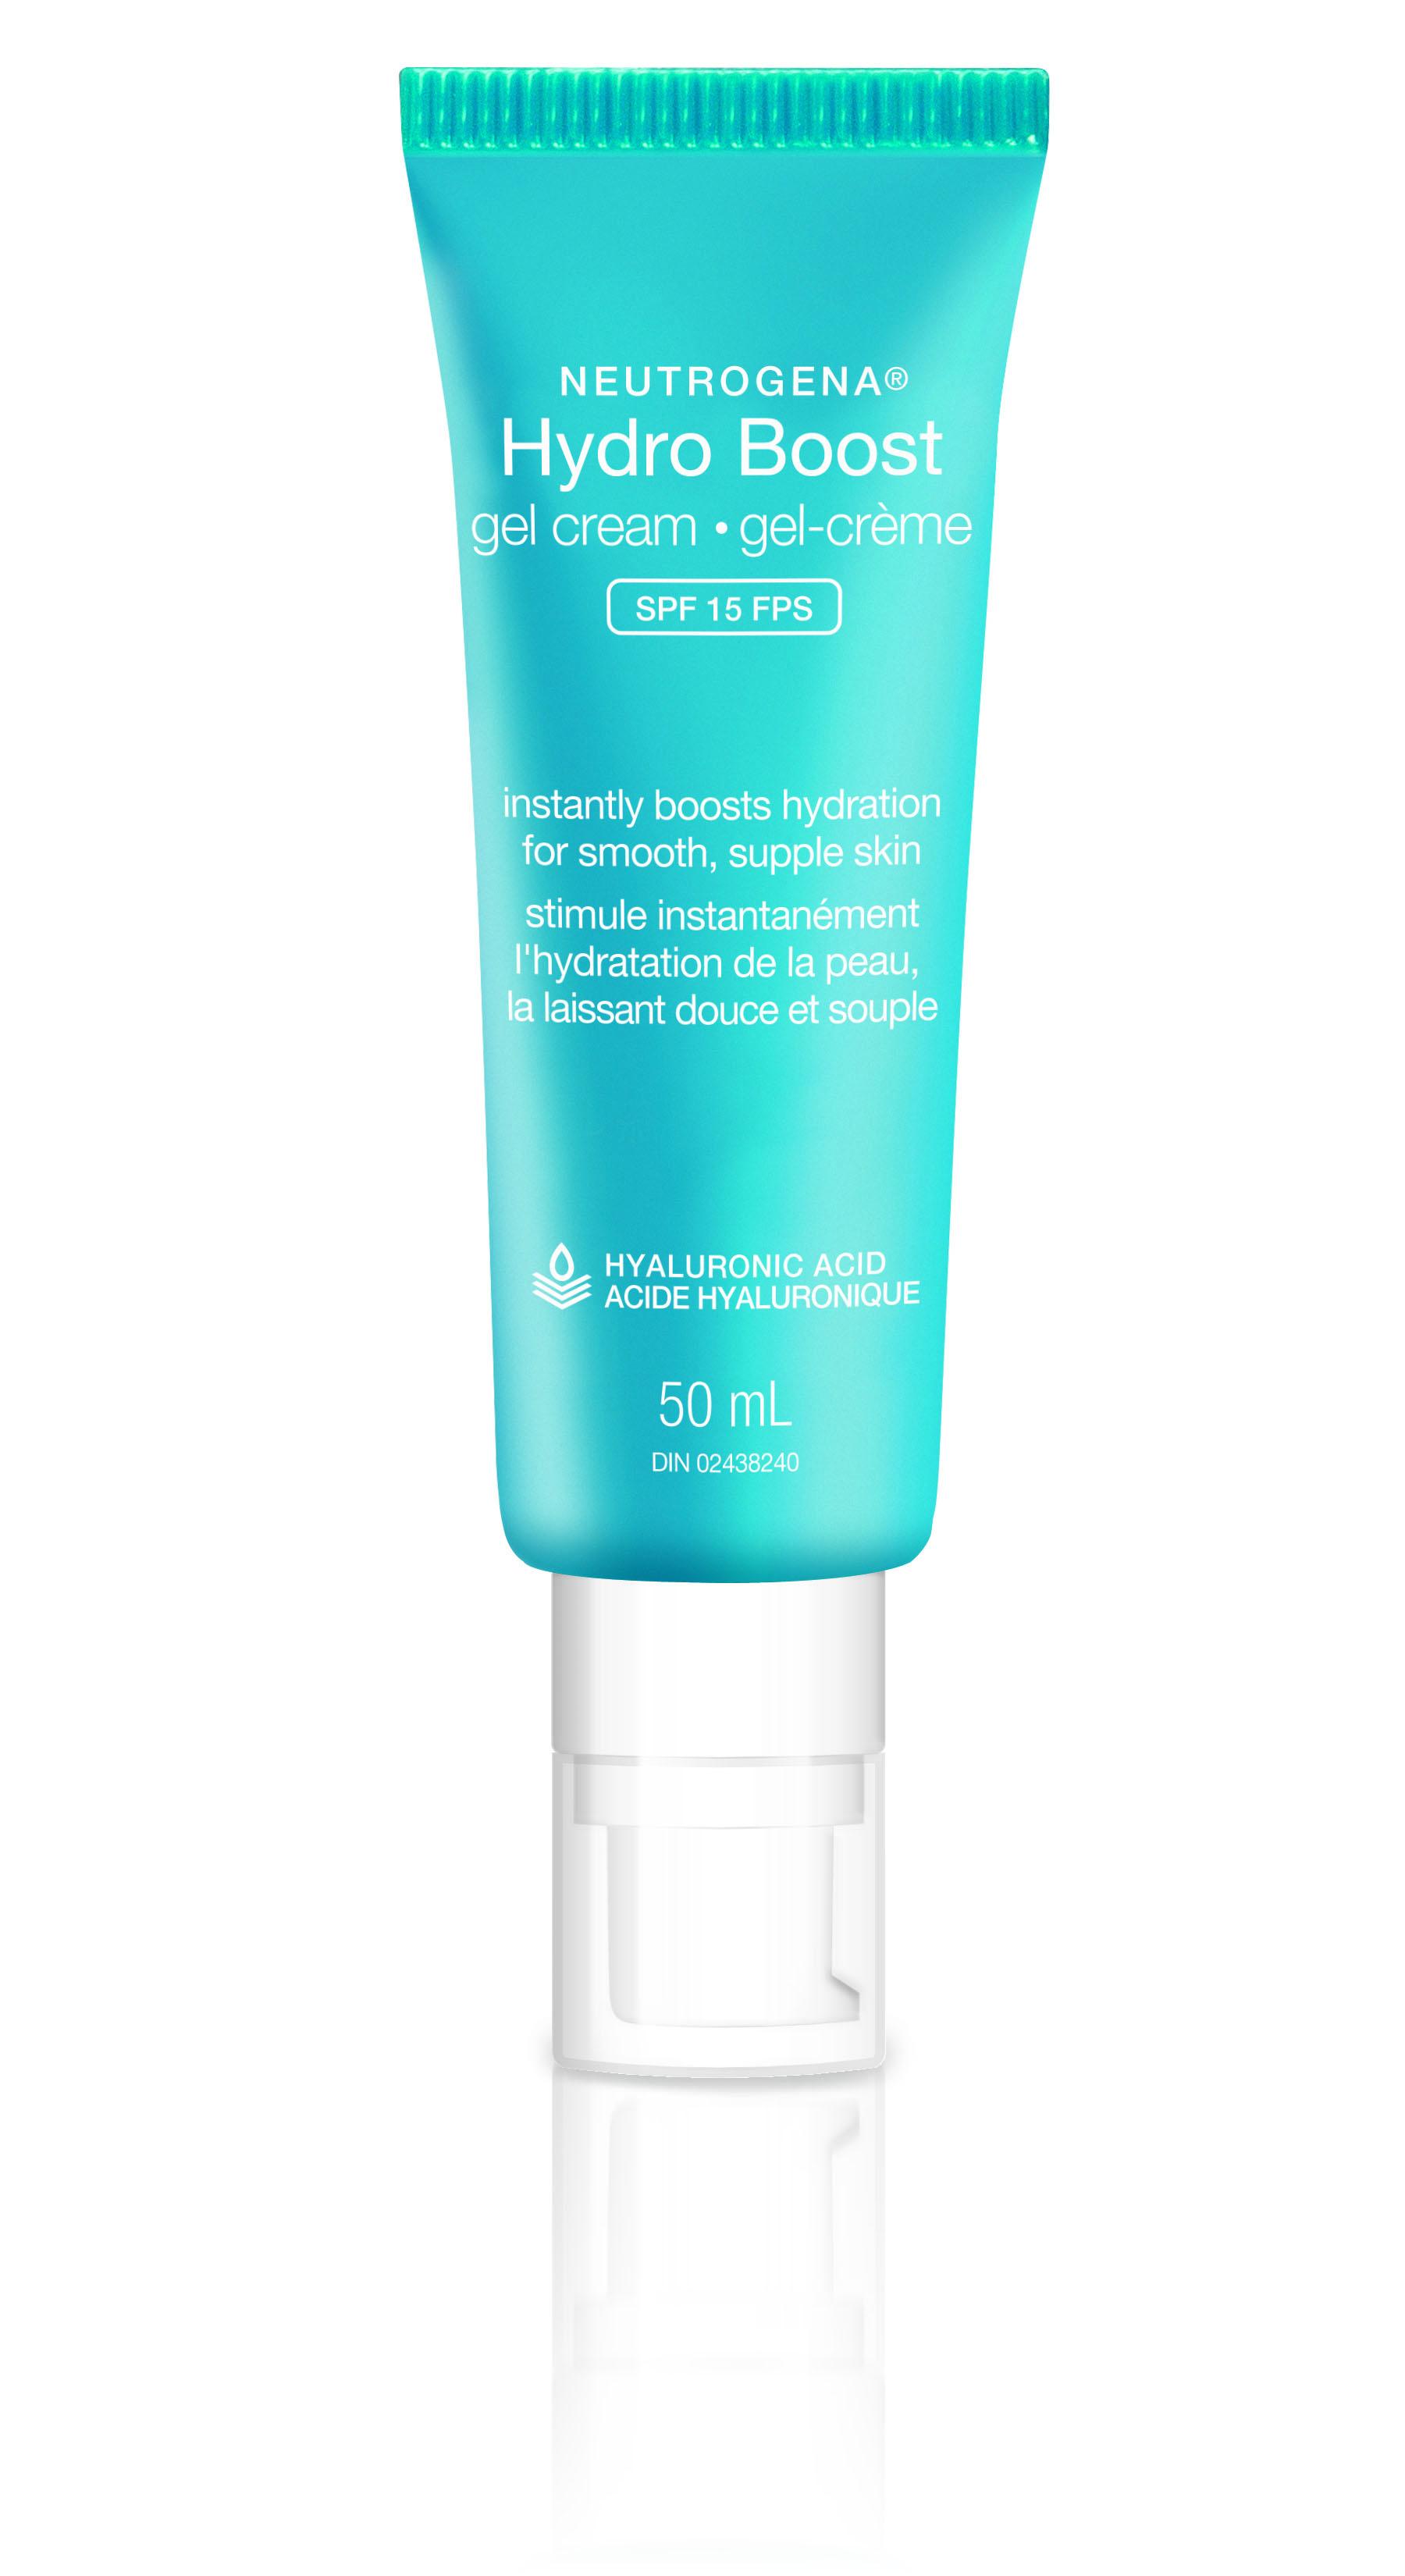 Neutrogena Hydro Boost Gel Cream SPF 15